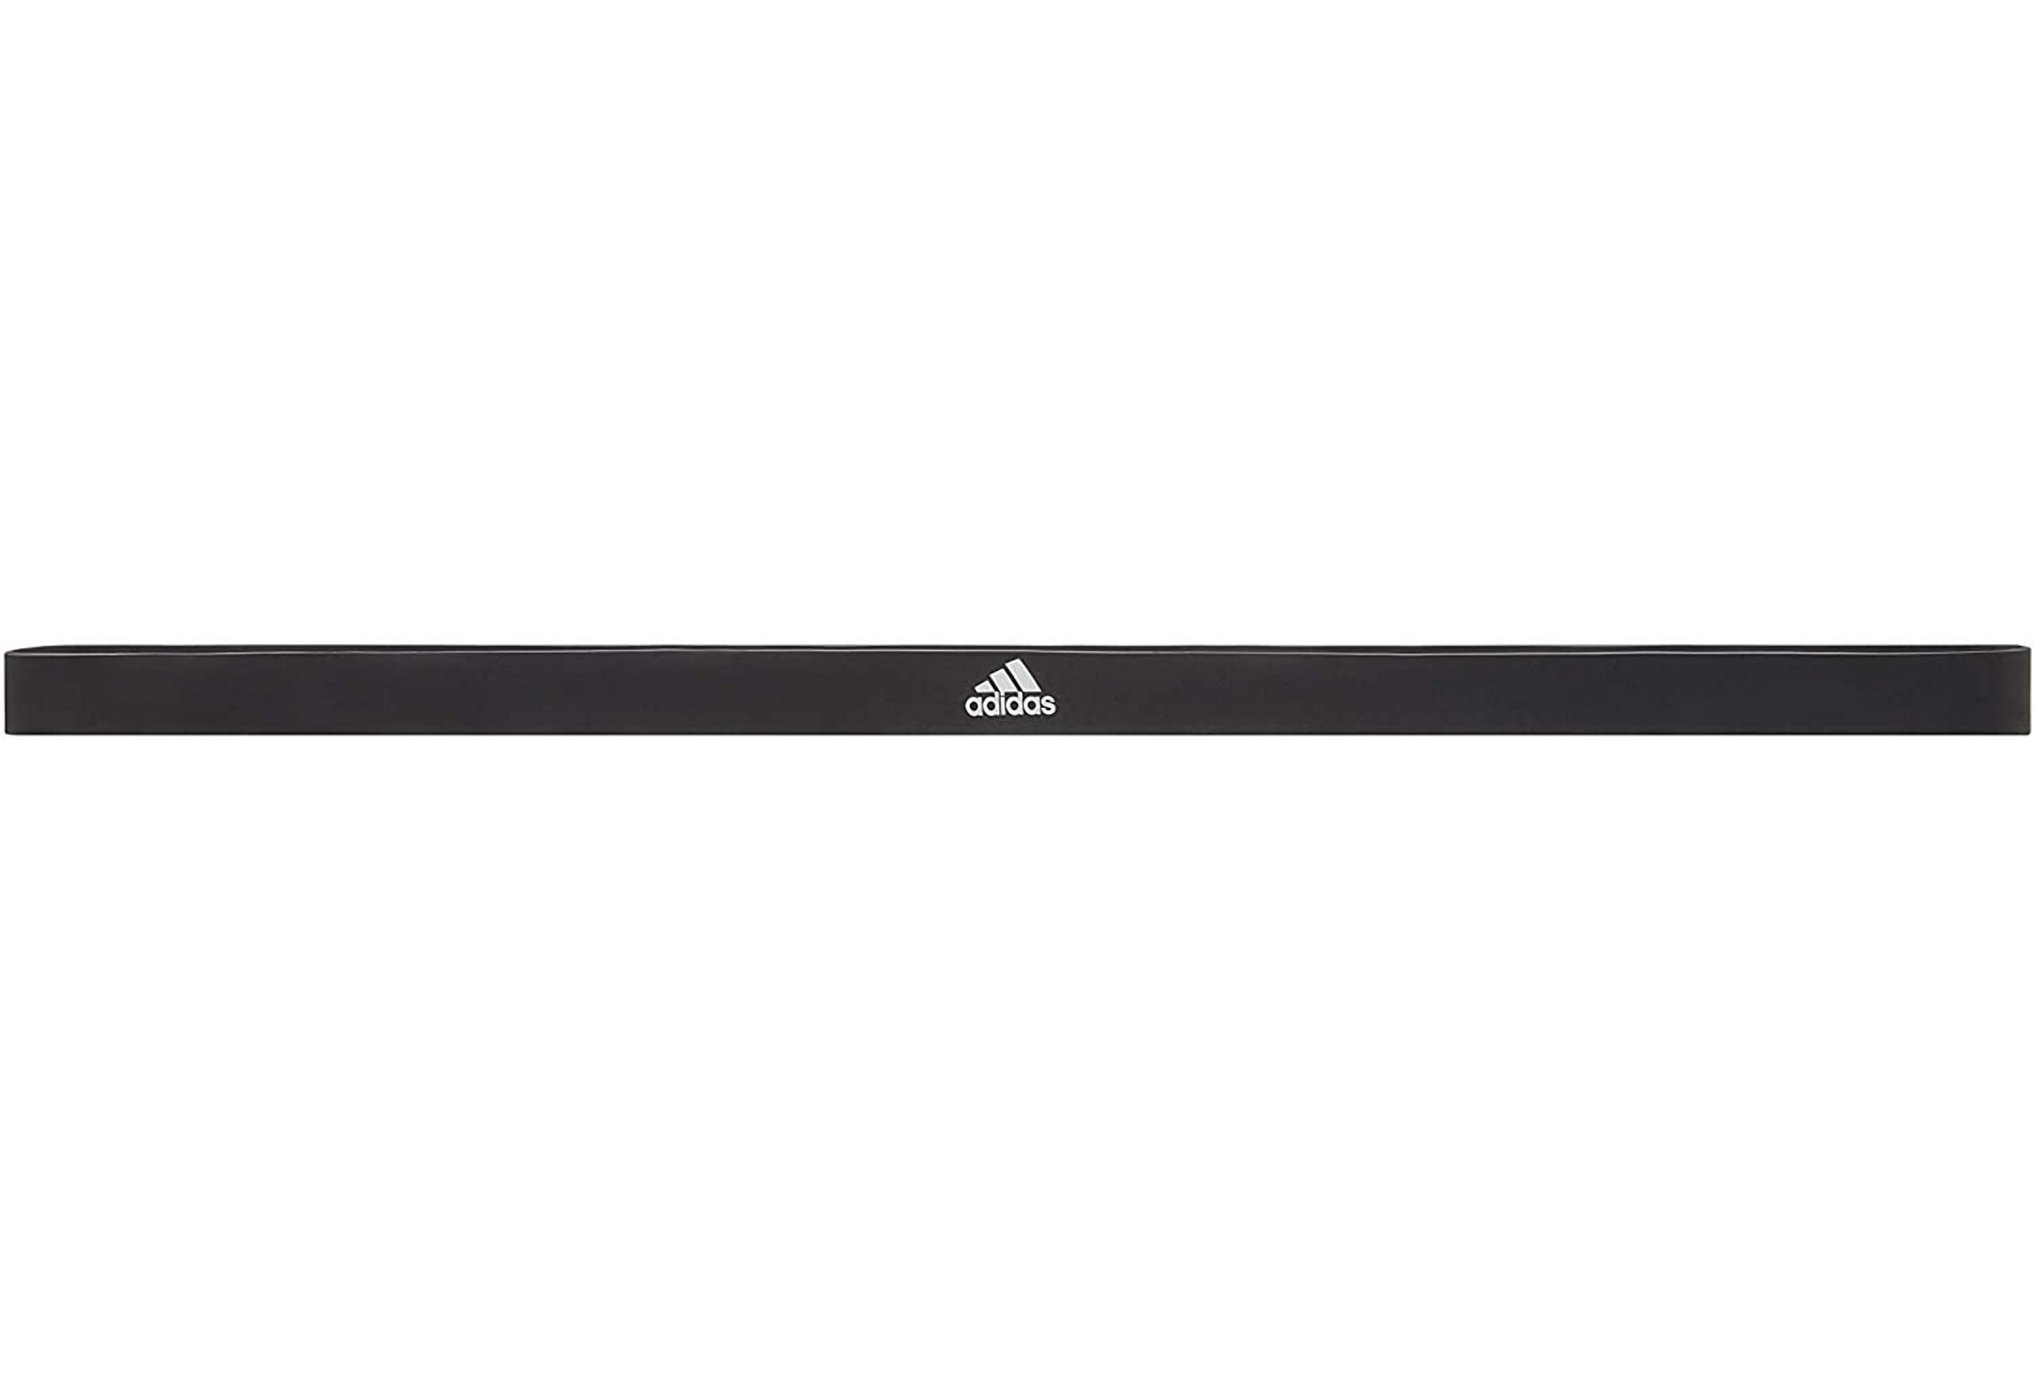 adidas Power Band - Medium Training